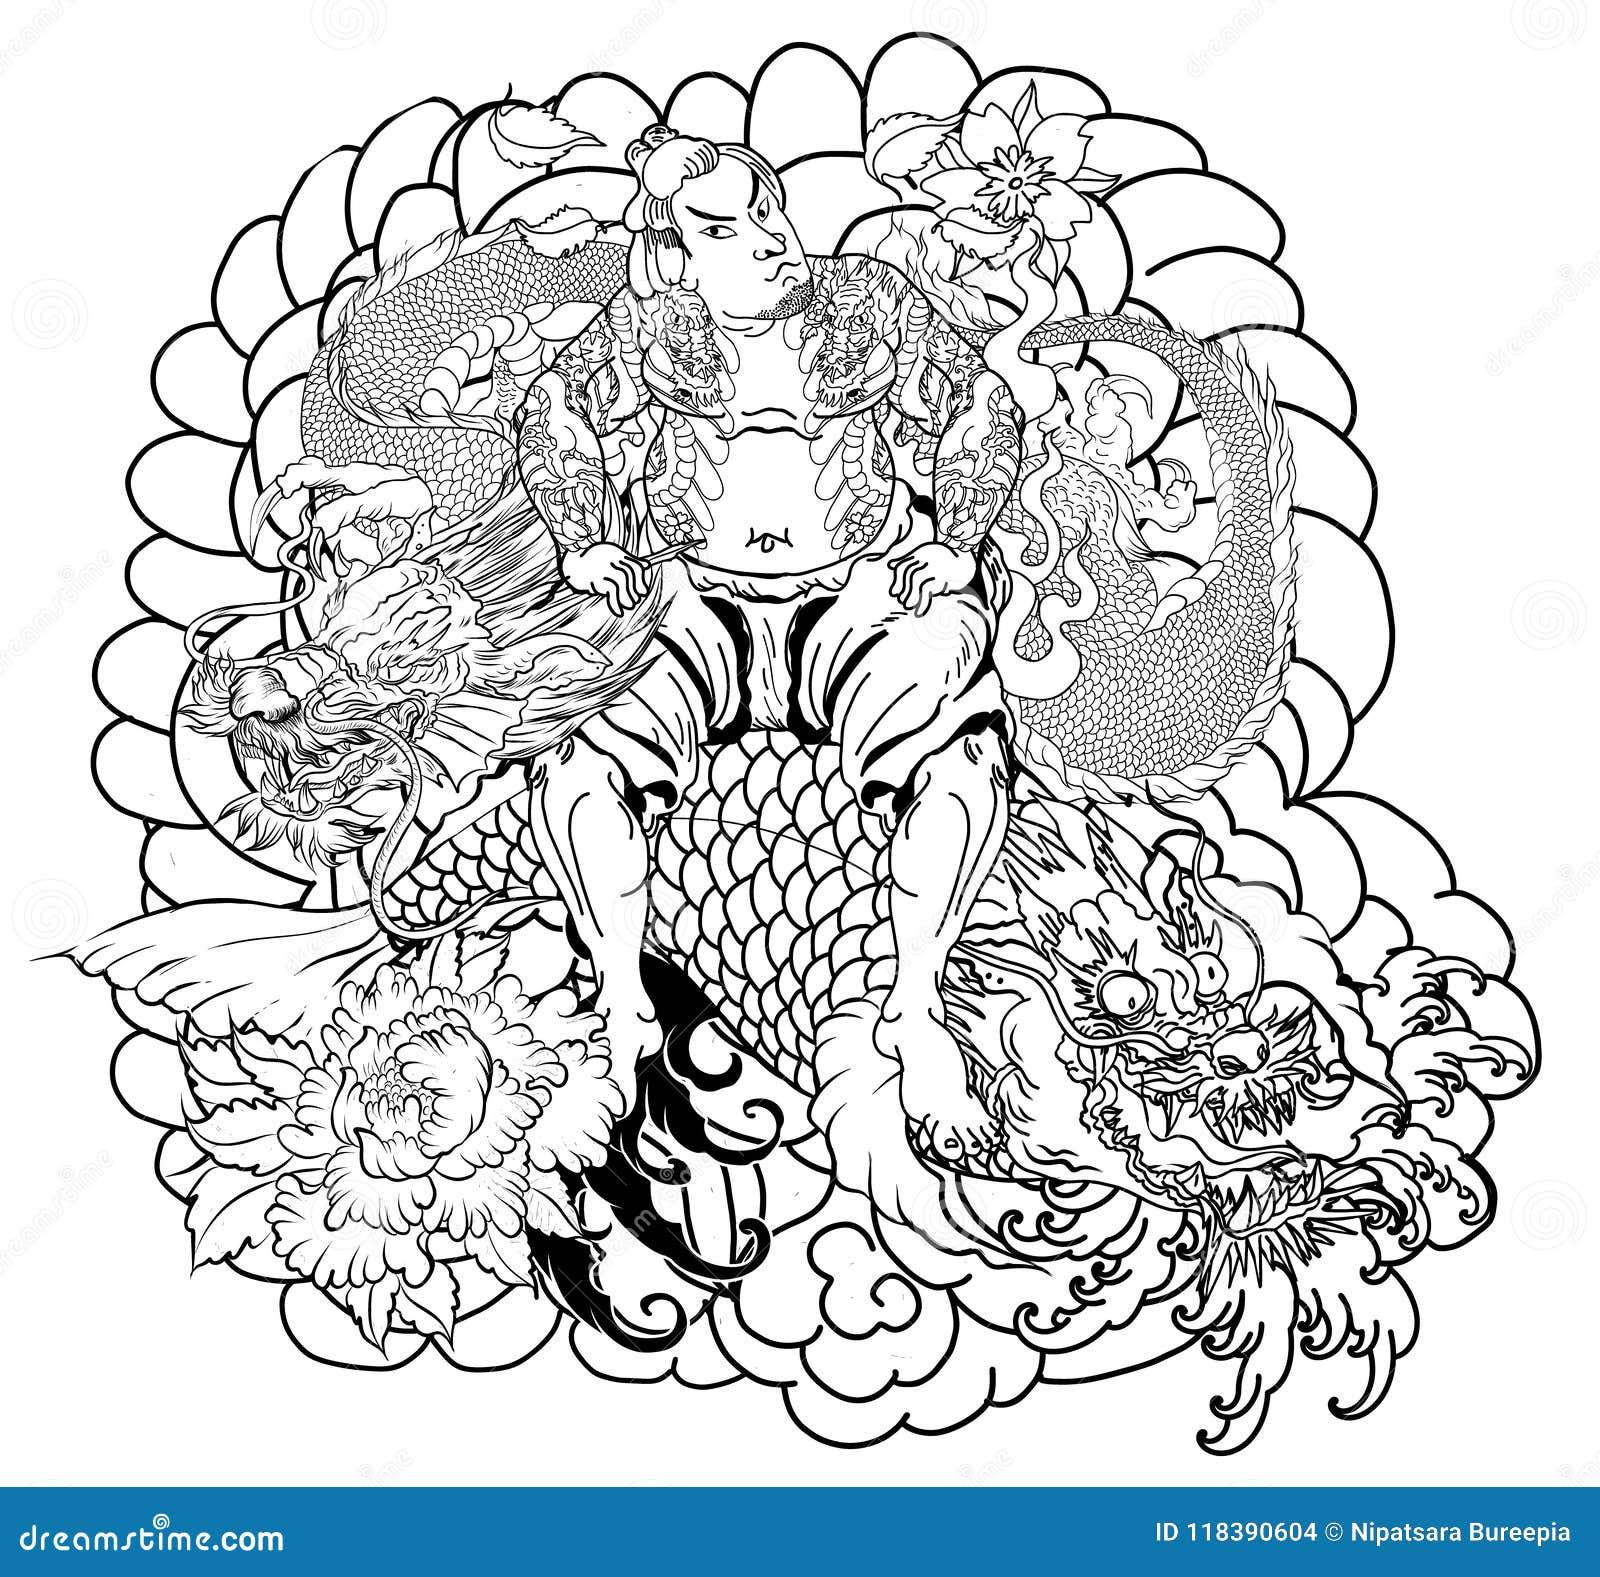 Japanese Samurai With Leaf And Dragon Tattoo Full Body Hand Drawn